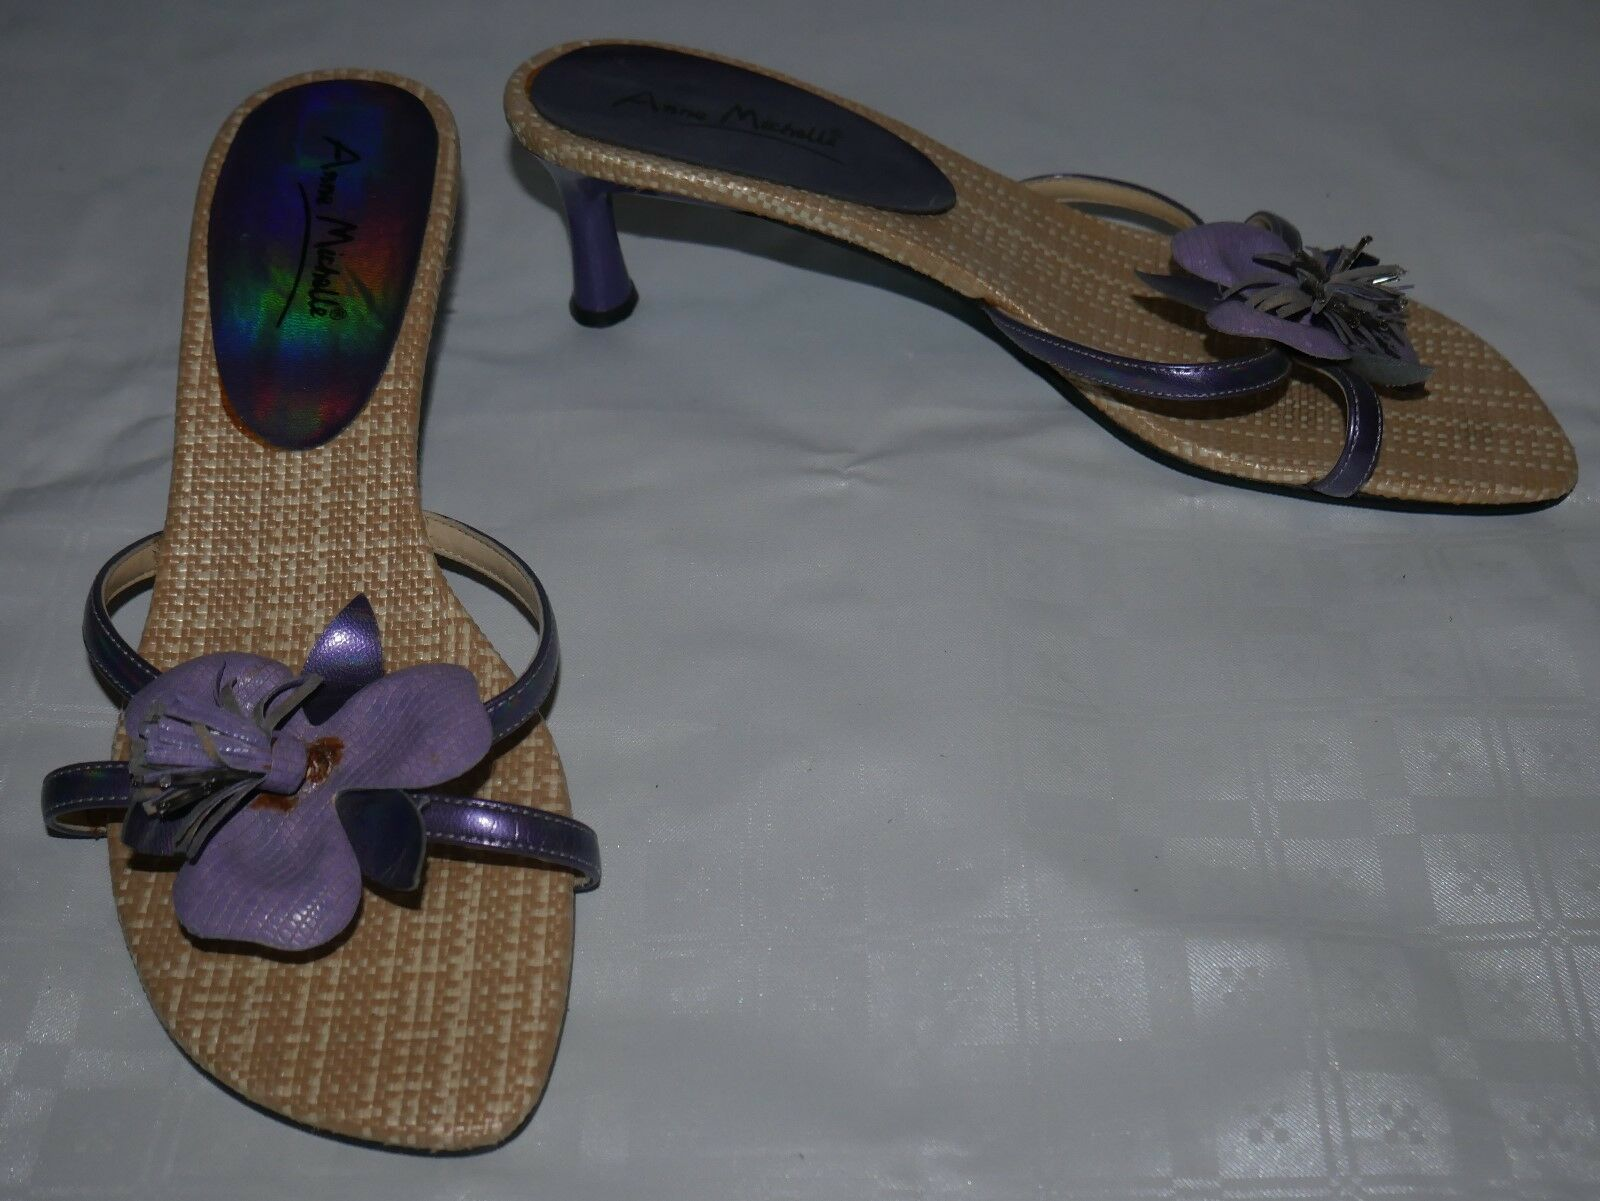 Moda jest prosta i niedroga Ladies Purple Anne Michelle Shoes Size 7 Floral Detail Sandals Heels